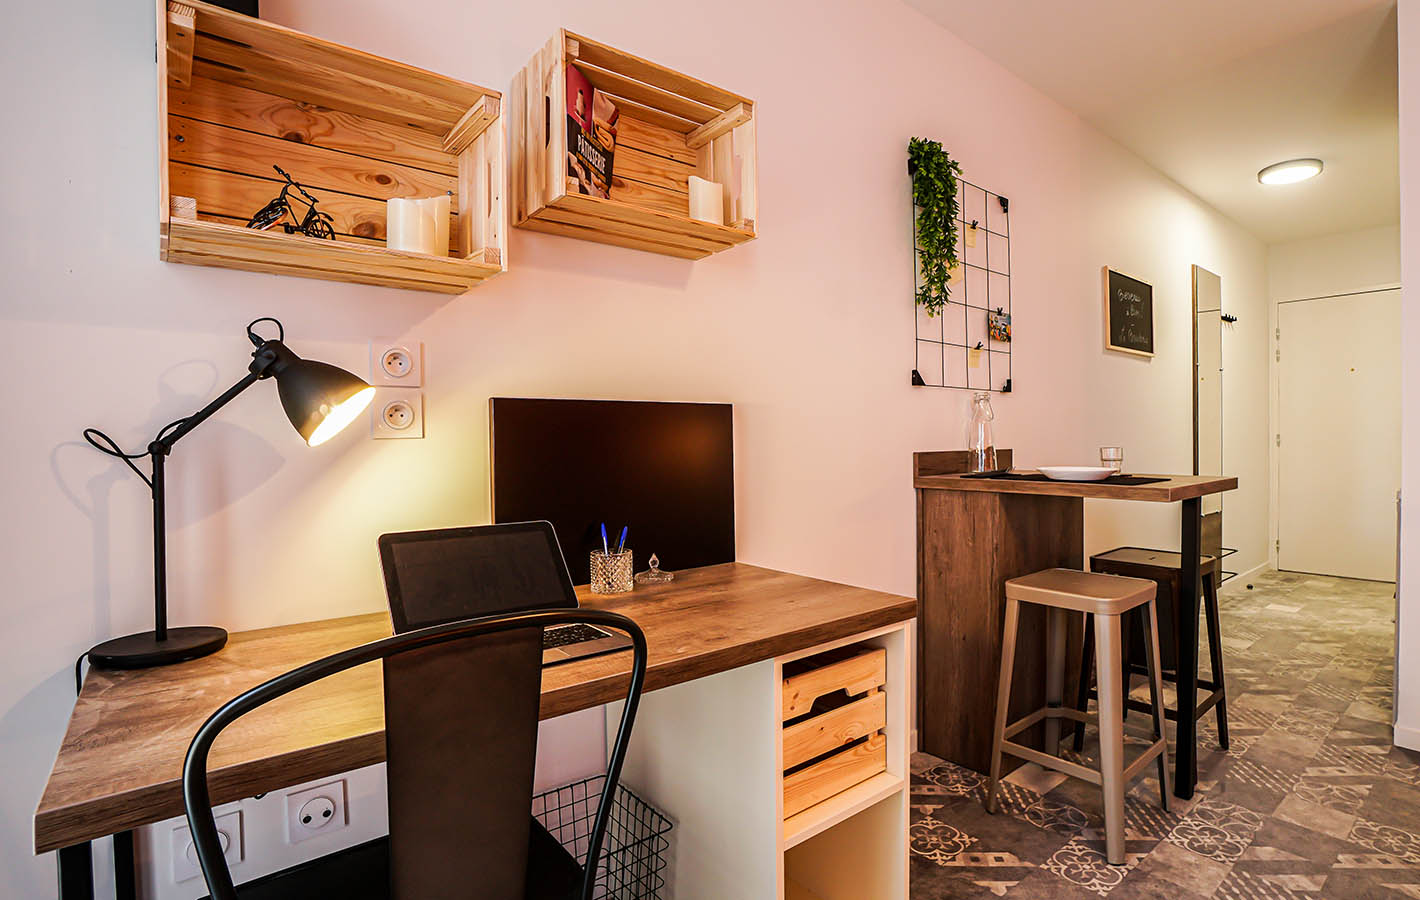 image  2021 04 15 residence etudiante suitetudes kabane montpellier studio bureau